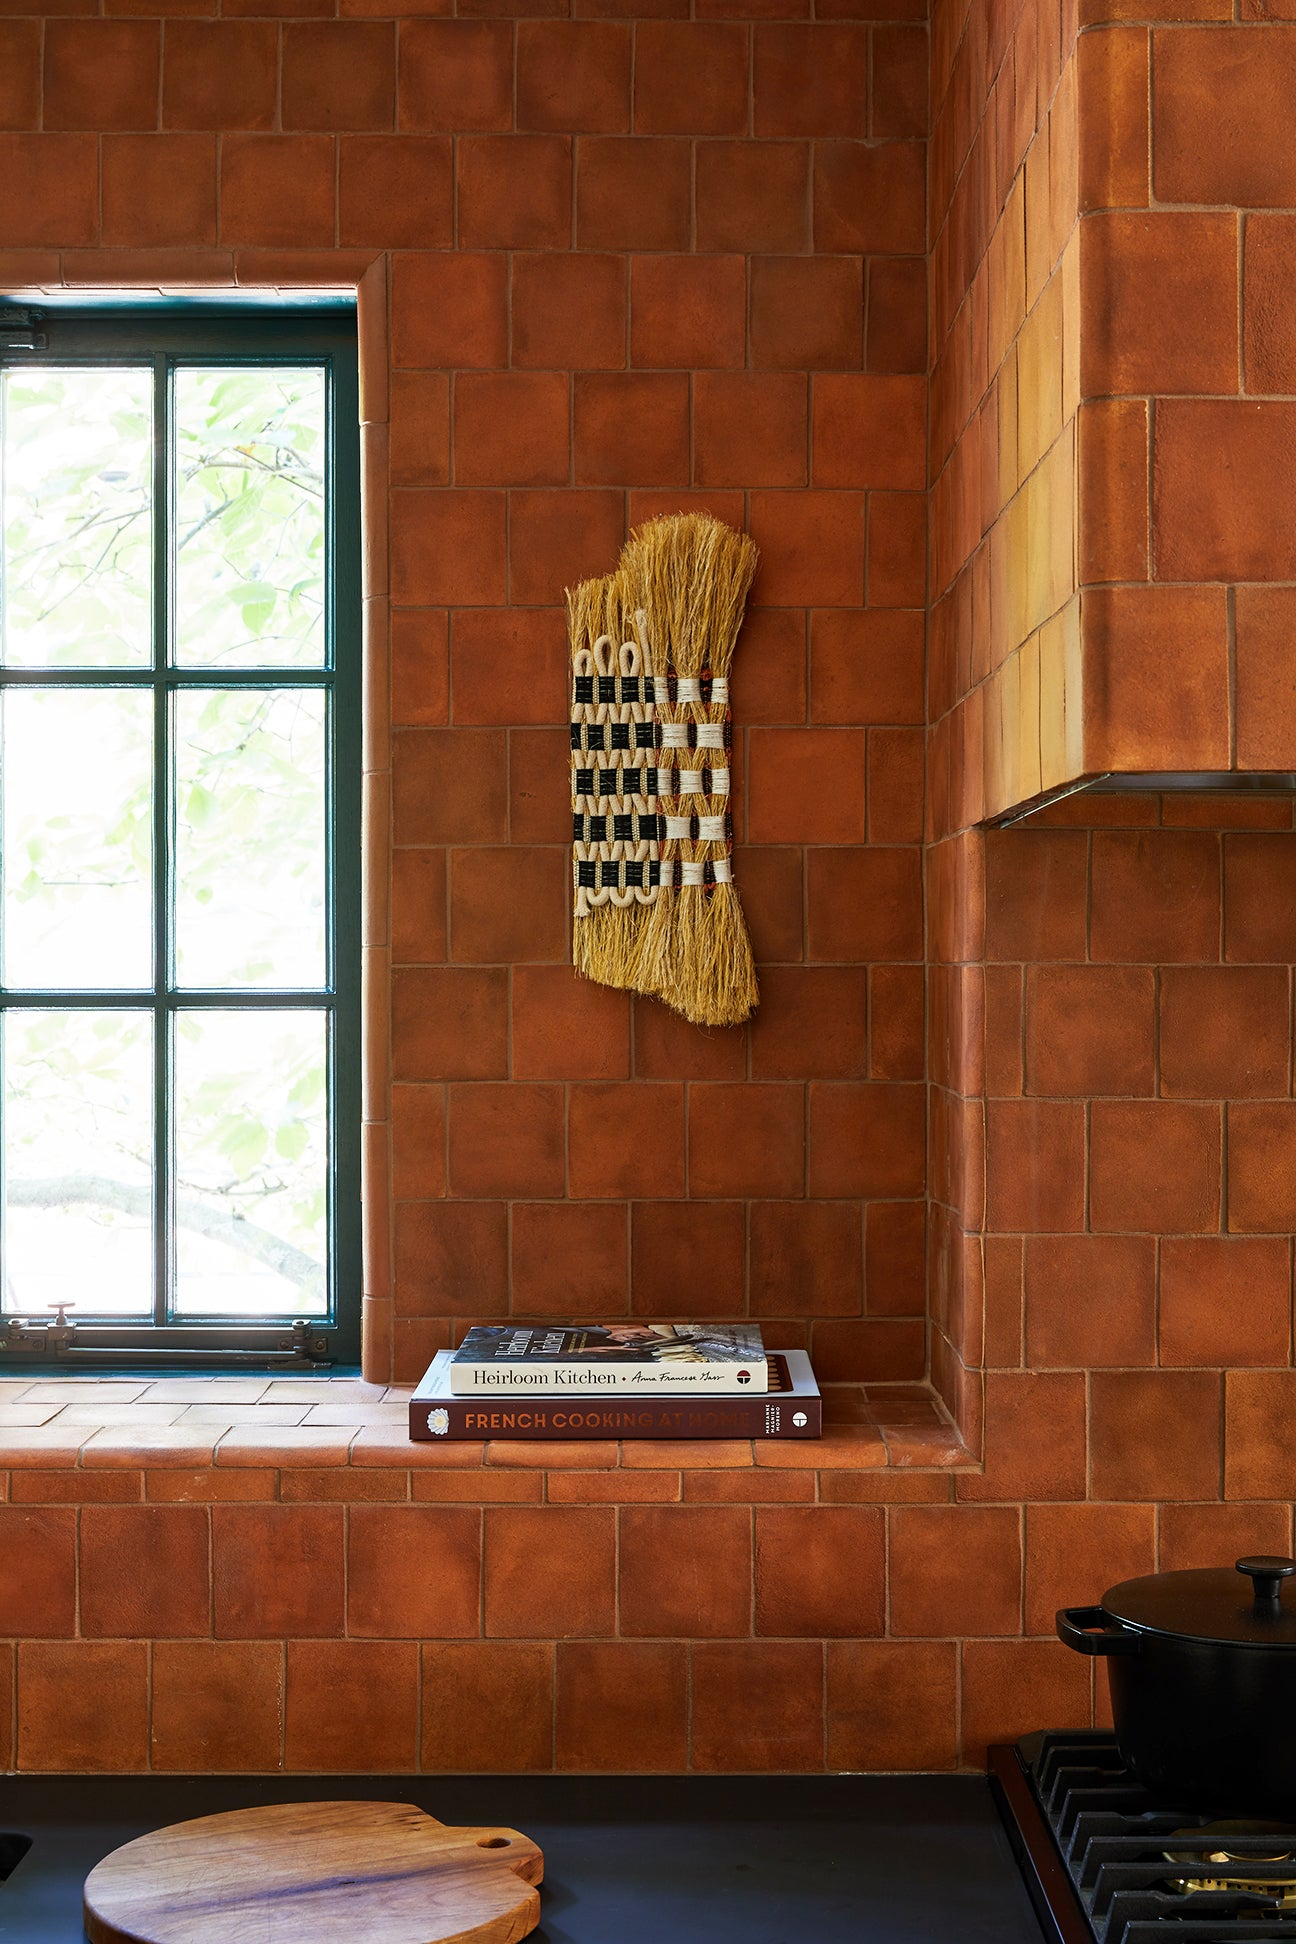 Terra Cotta Tile in Kitchen